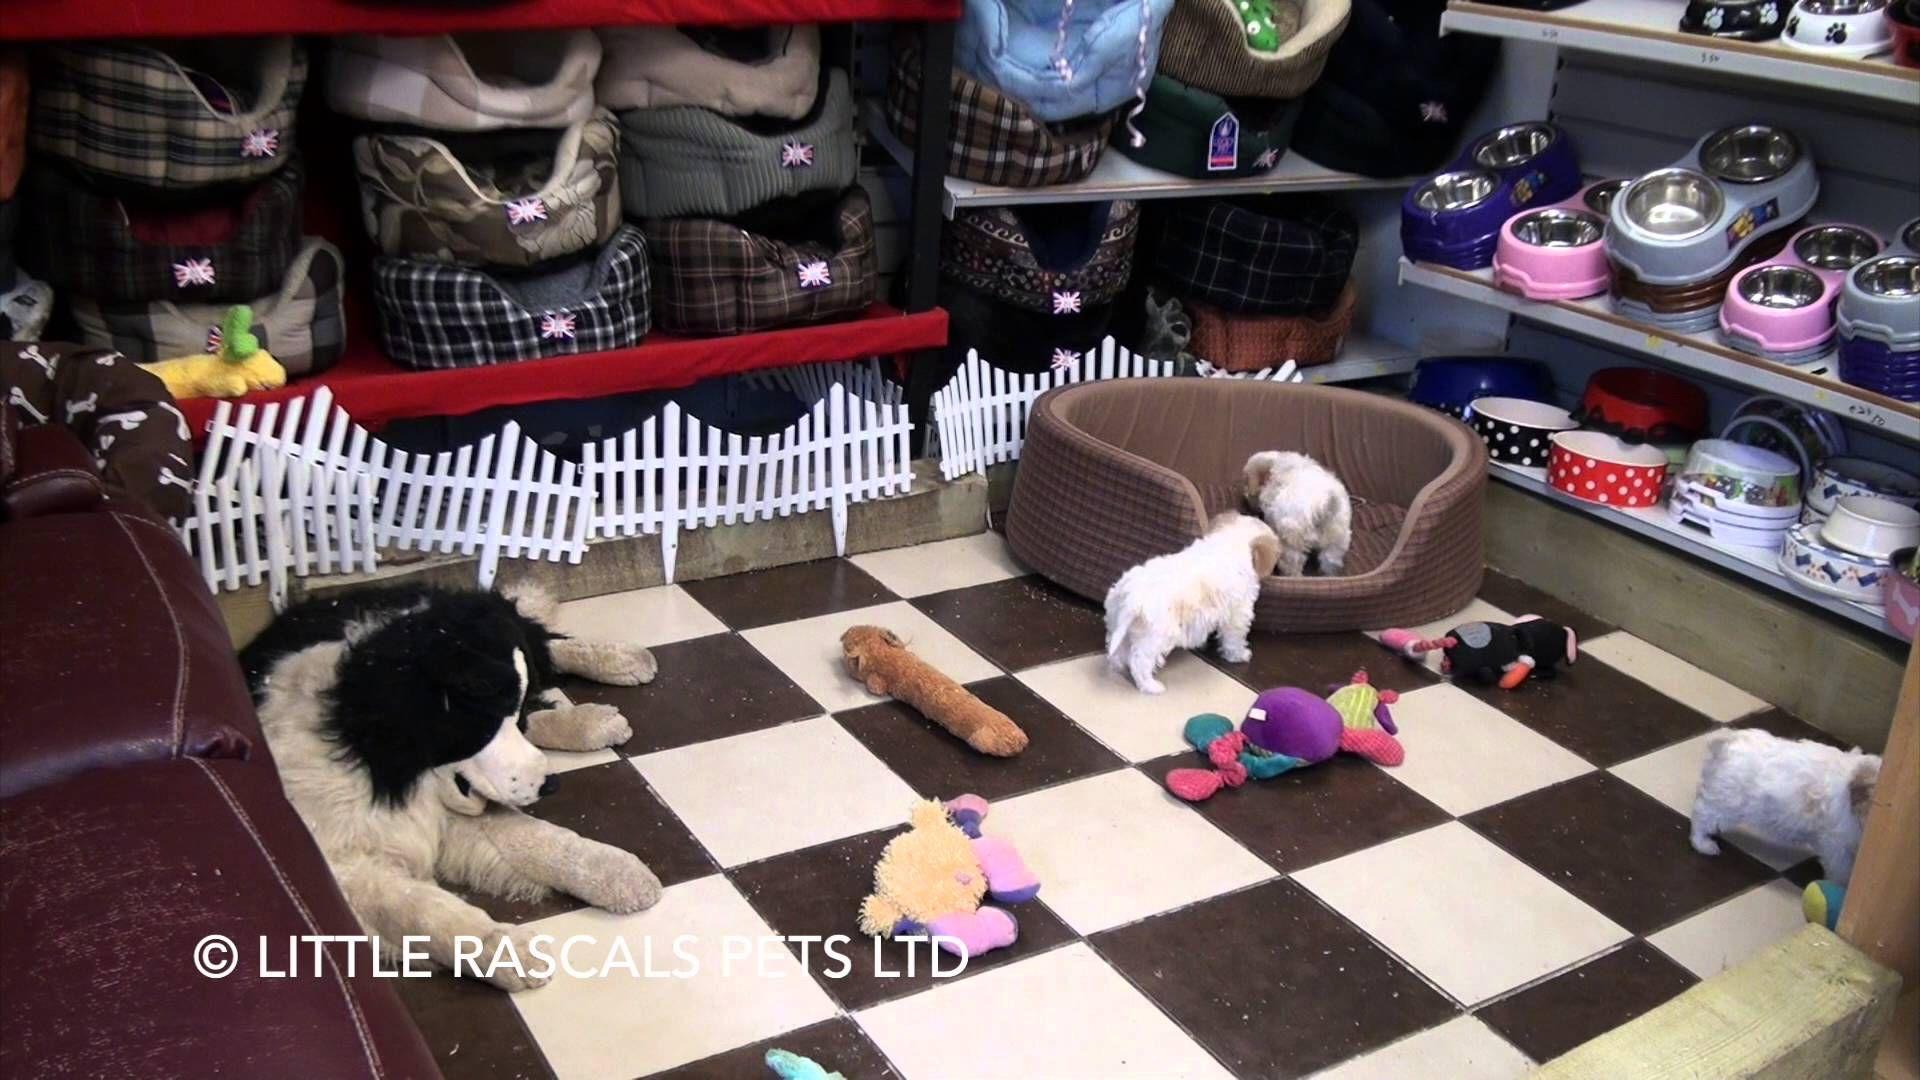 Little Rascals Uk Breeders New Litter Of Cavachon Pups Puppies For Sale 2016 Miniature Schnauzer Puppies Pug Puppies Puppies For Sale